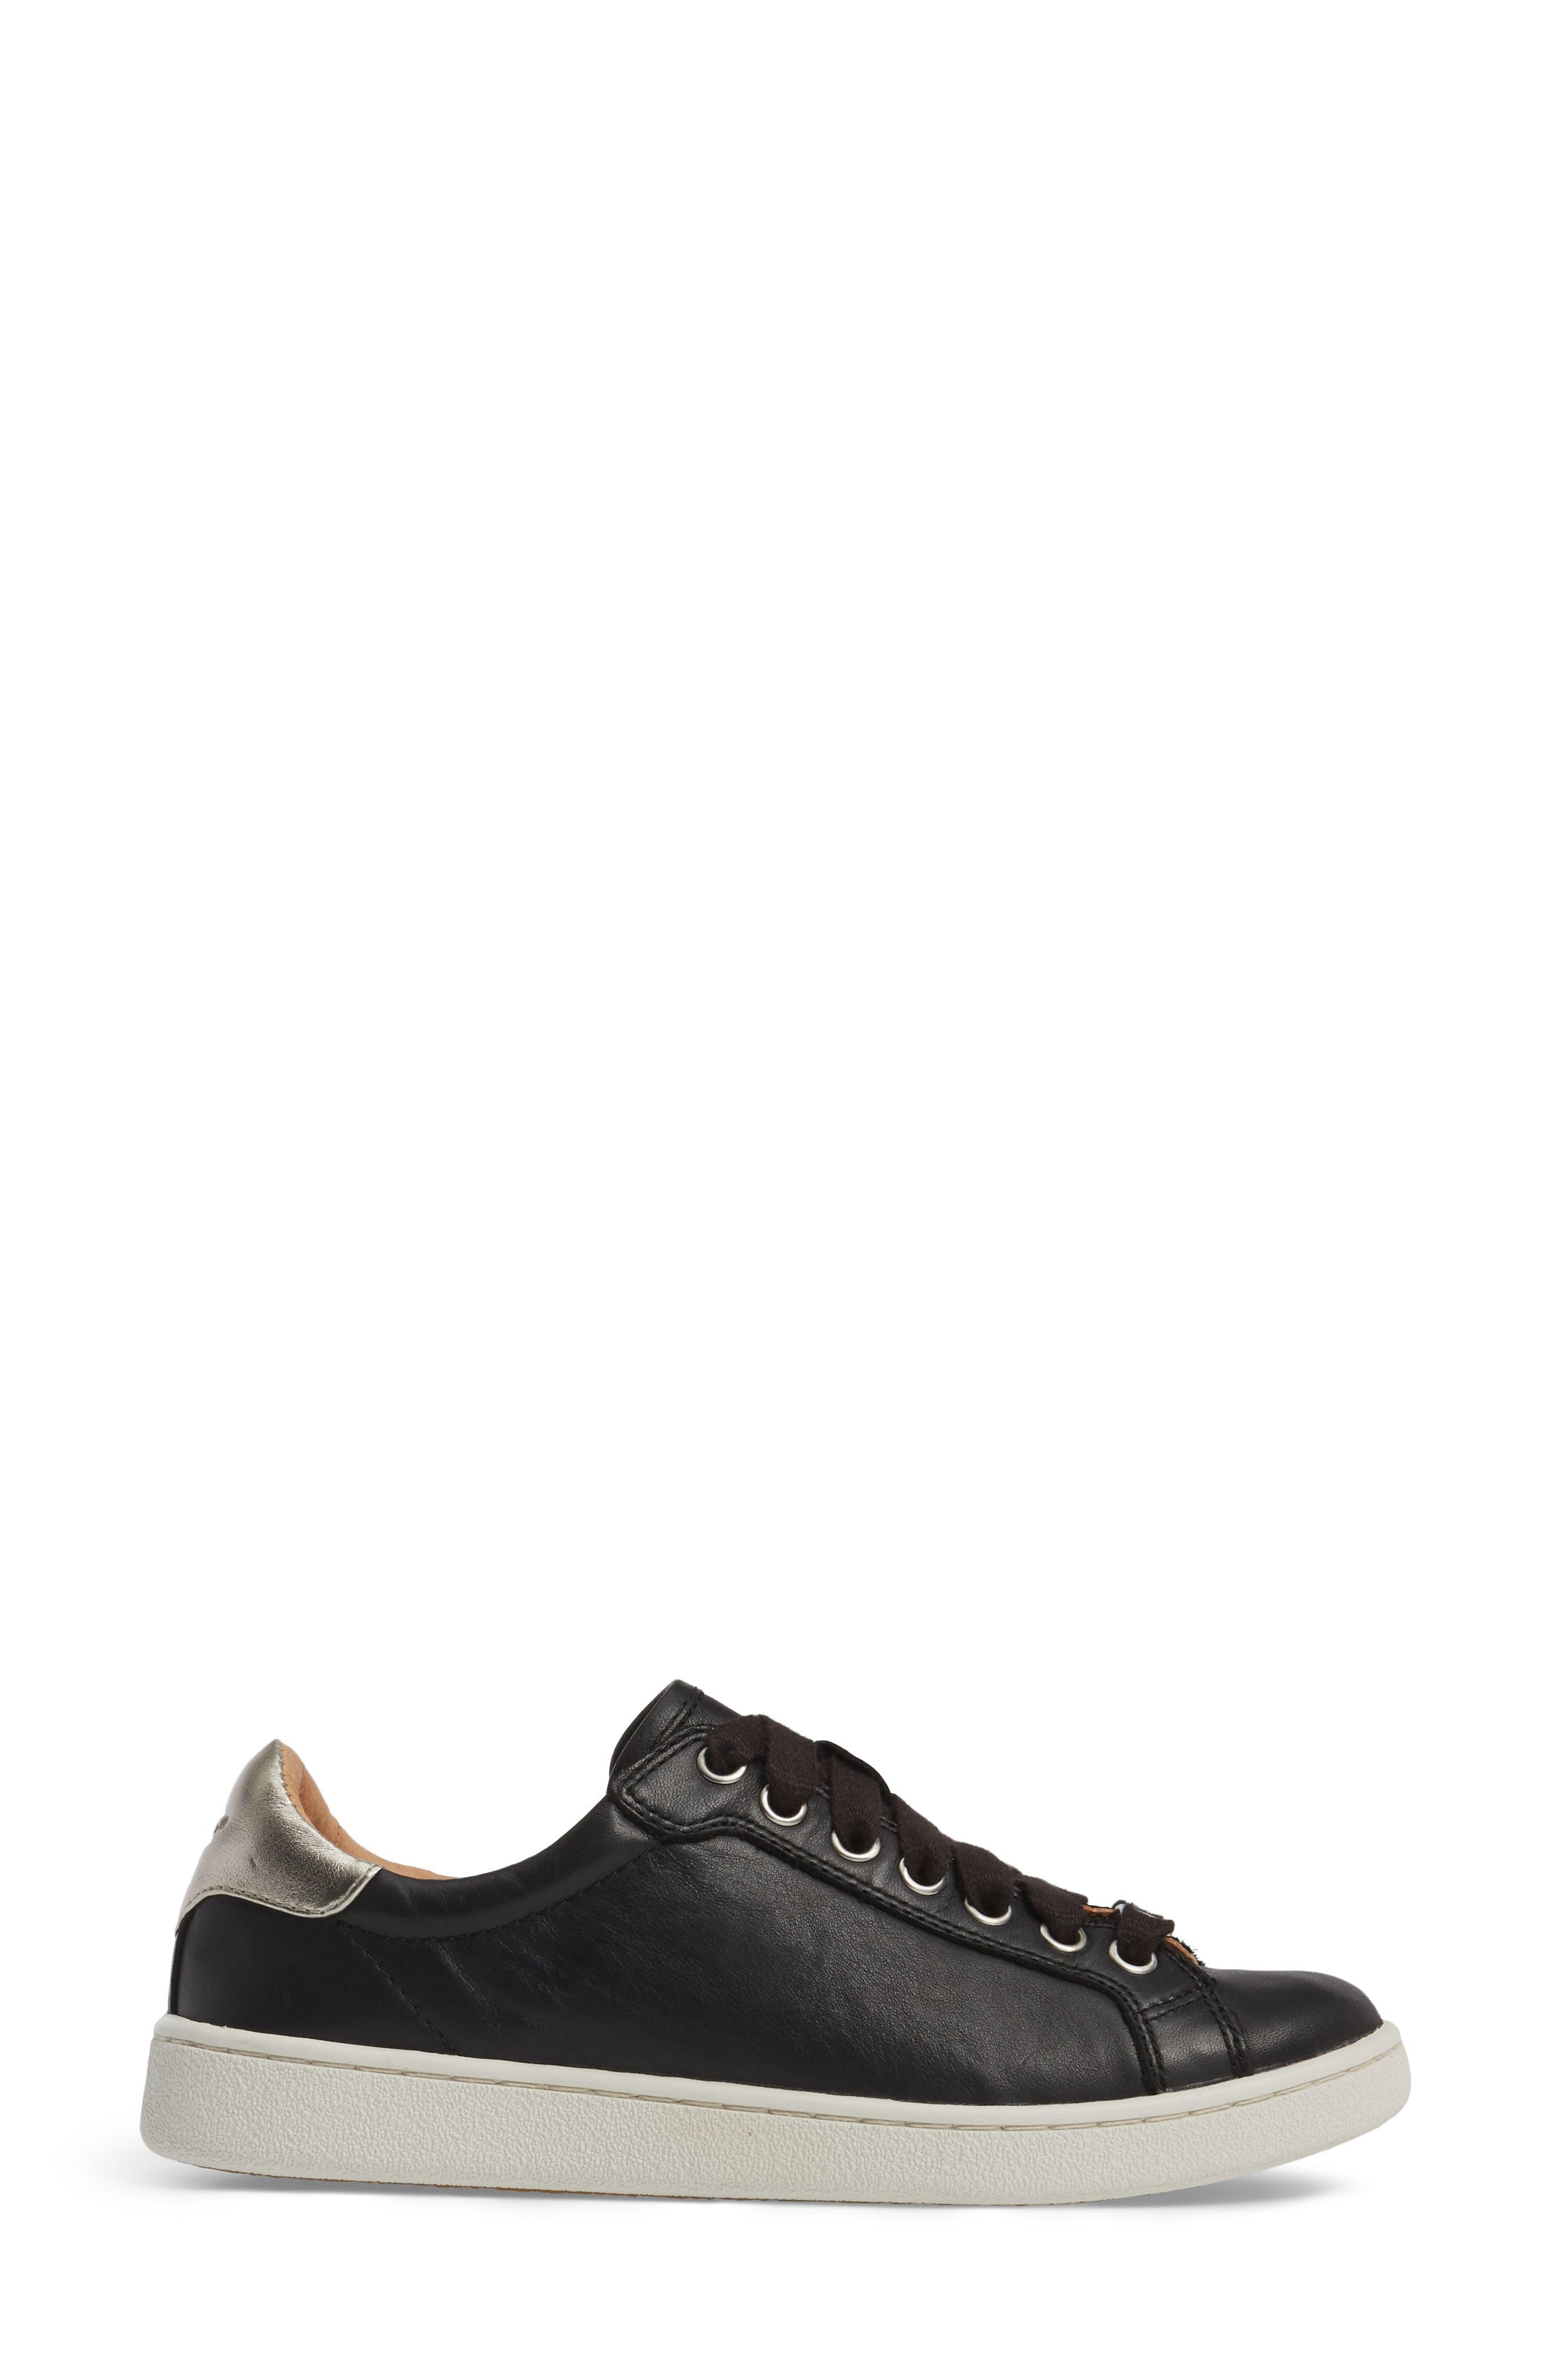 Milo Sneaker,                             Alternate thumbnail 3, color,                             Black Leather